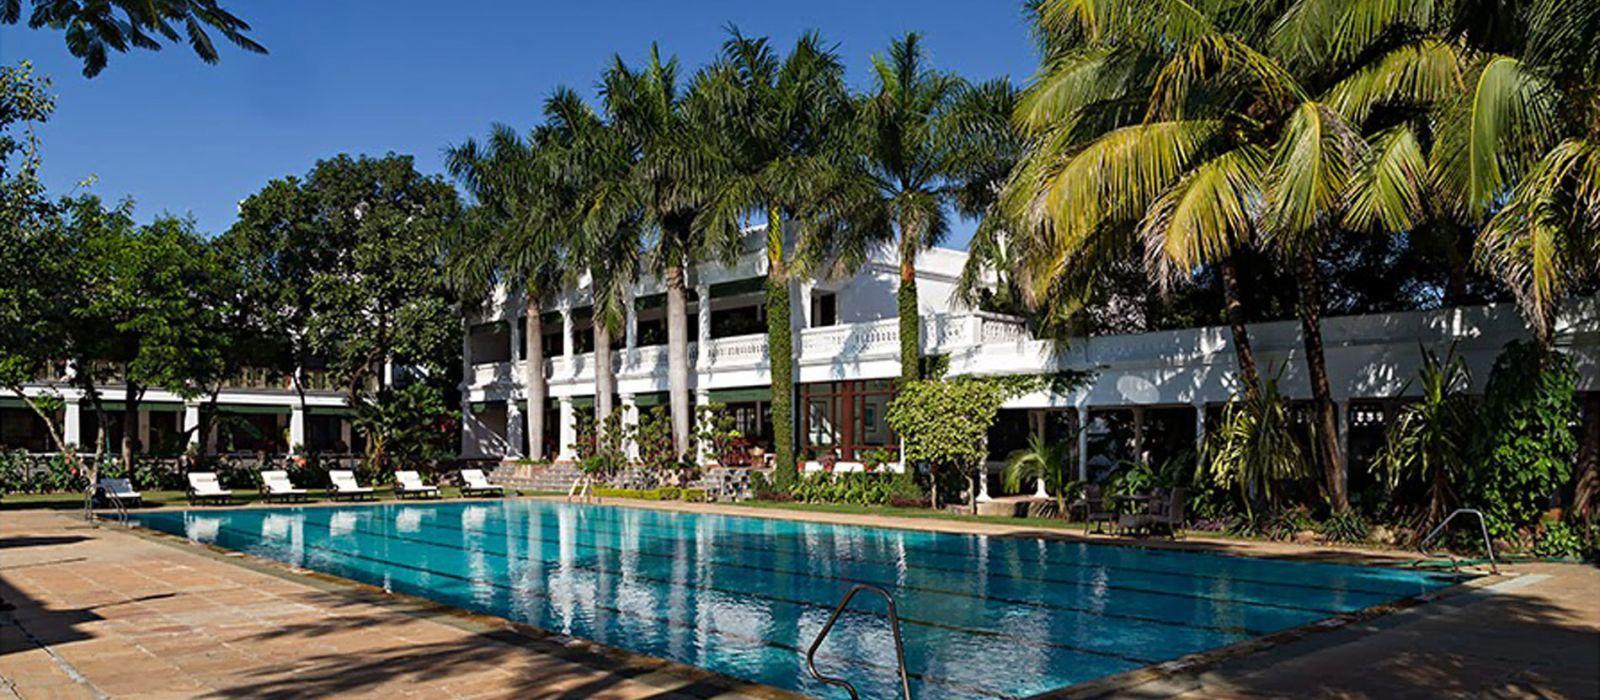 Hotel Jehan Numa Palace Central & West India